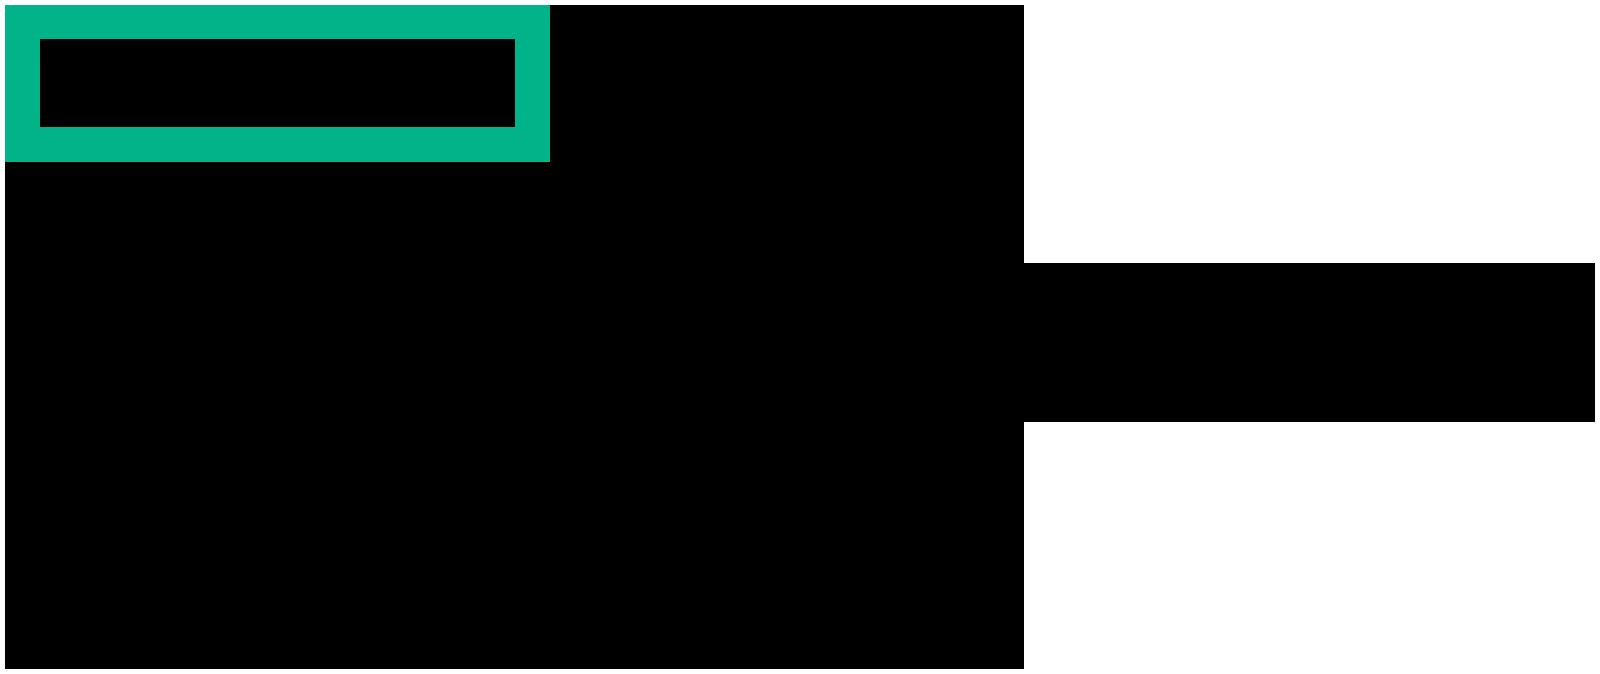 Hewlett Packard Entreprise logo